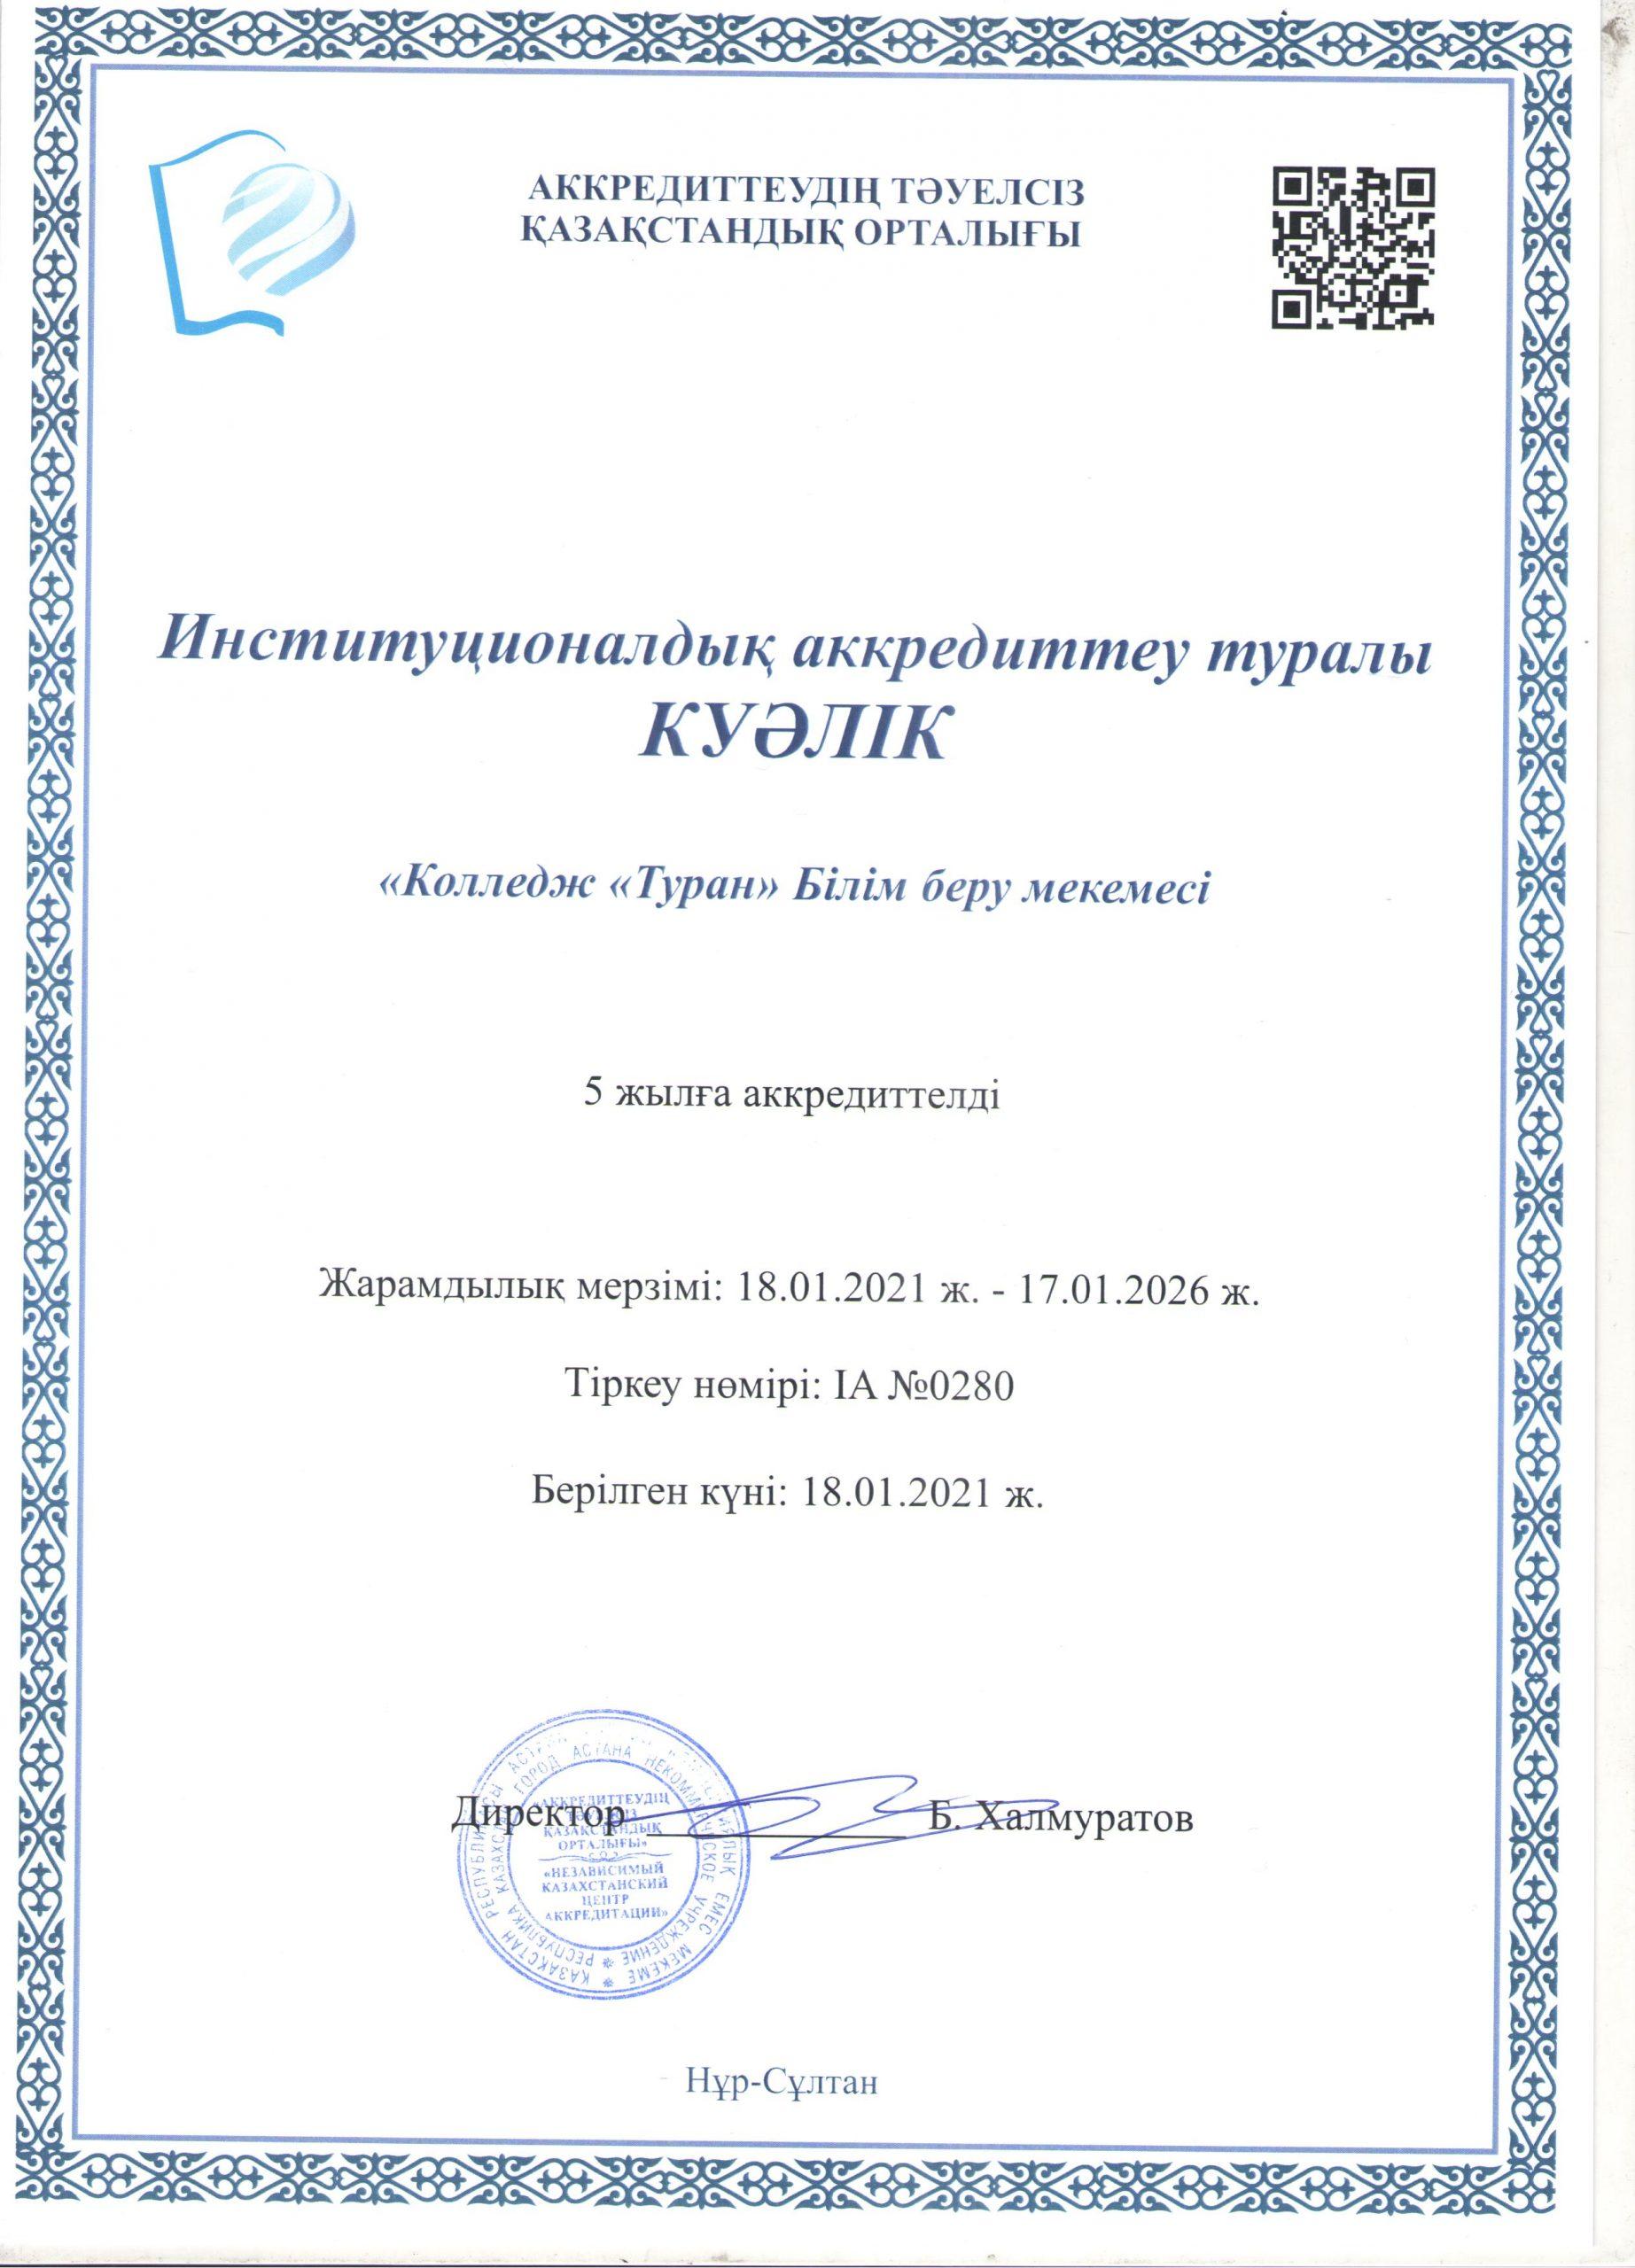 сертификат4 001